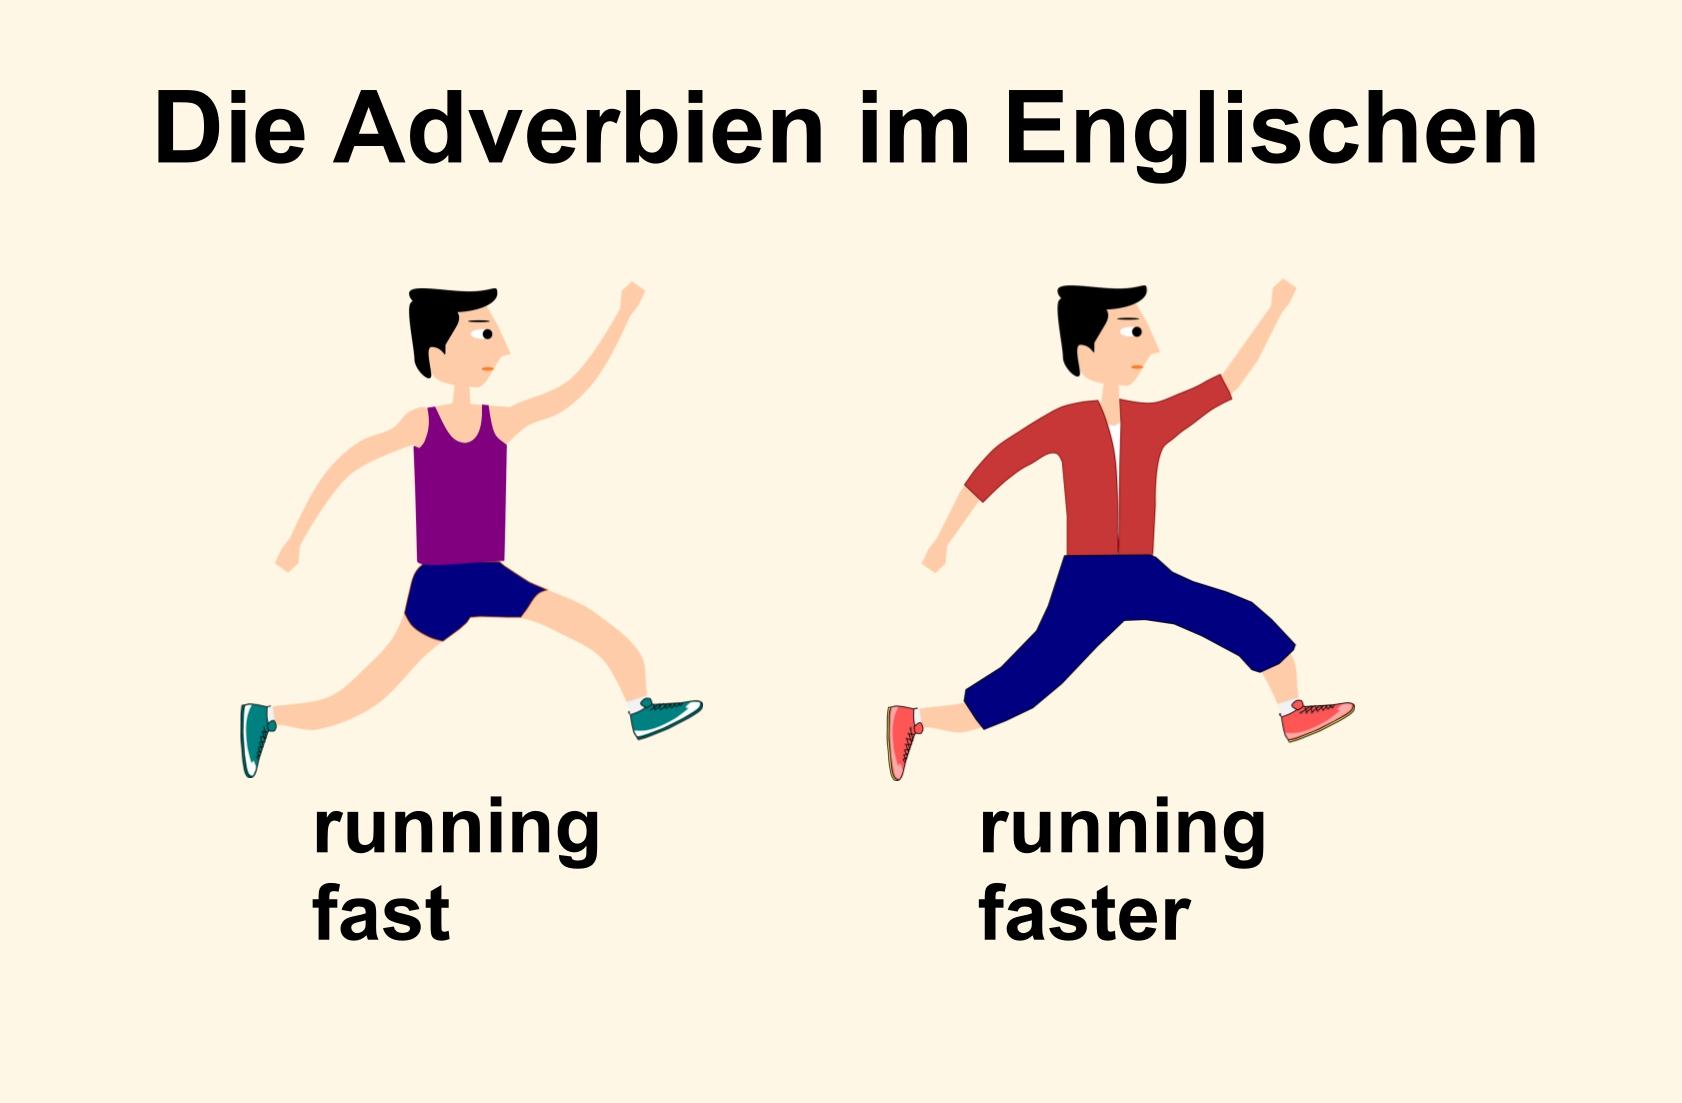 Englische Adverbien